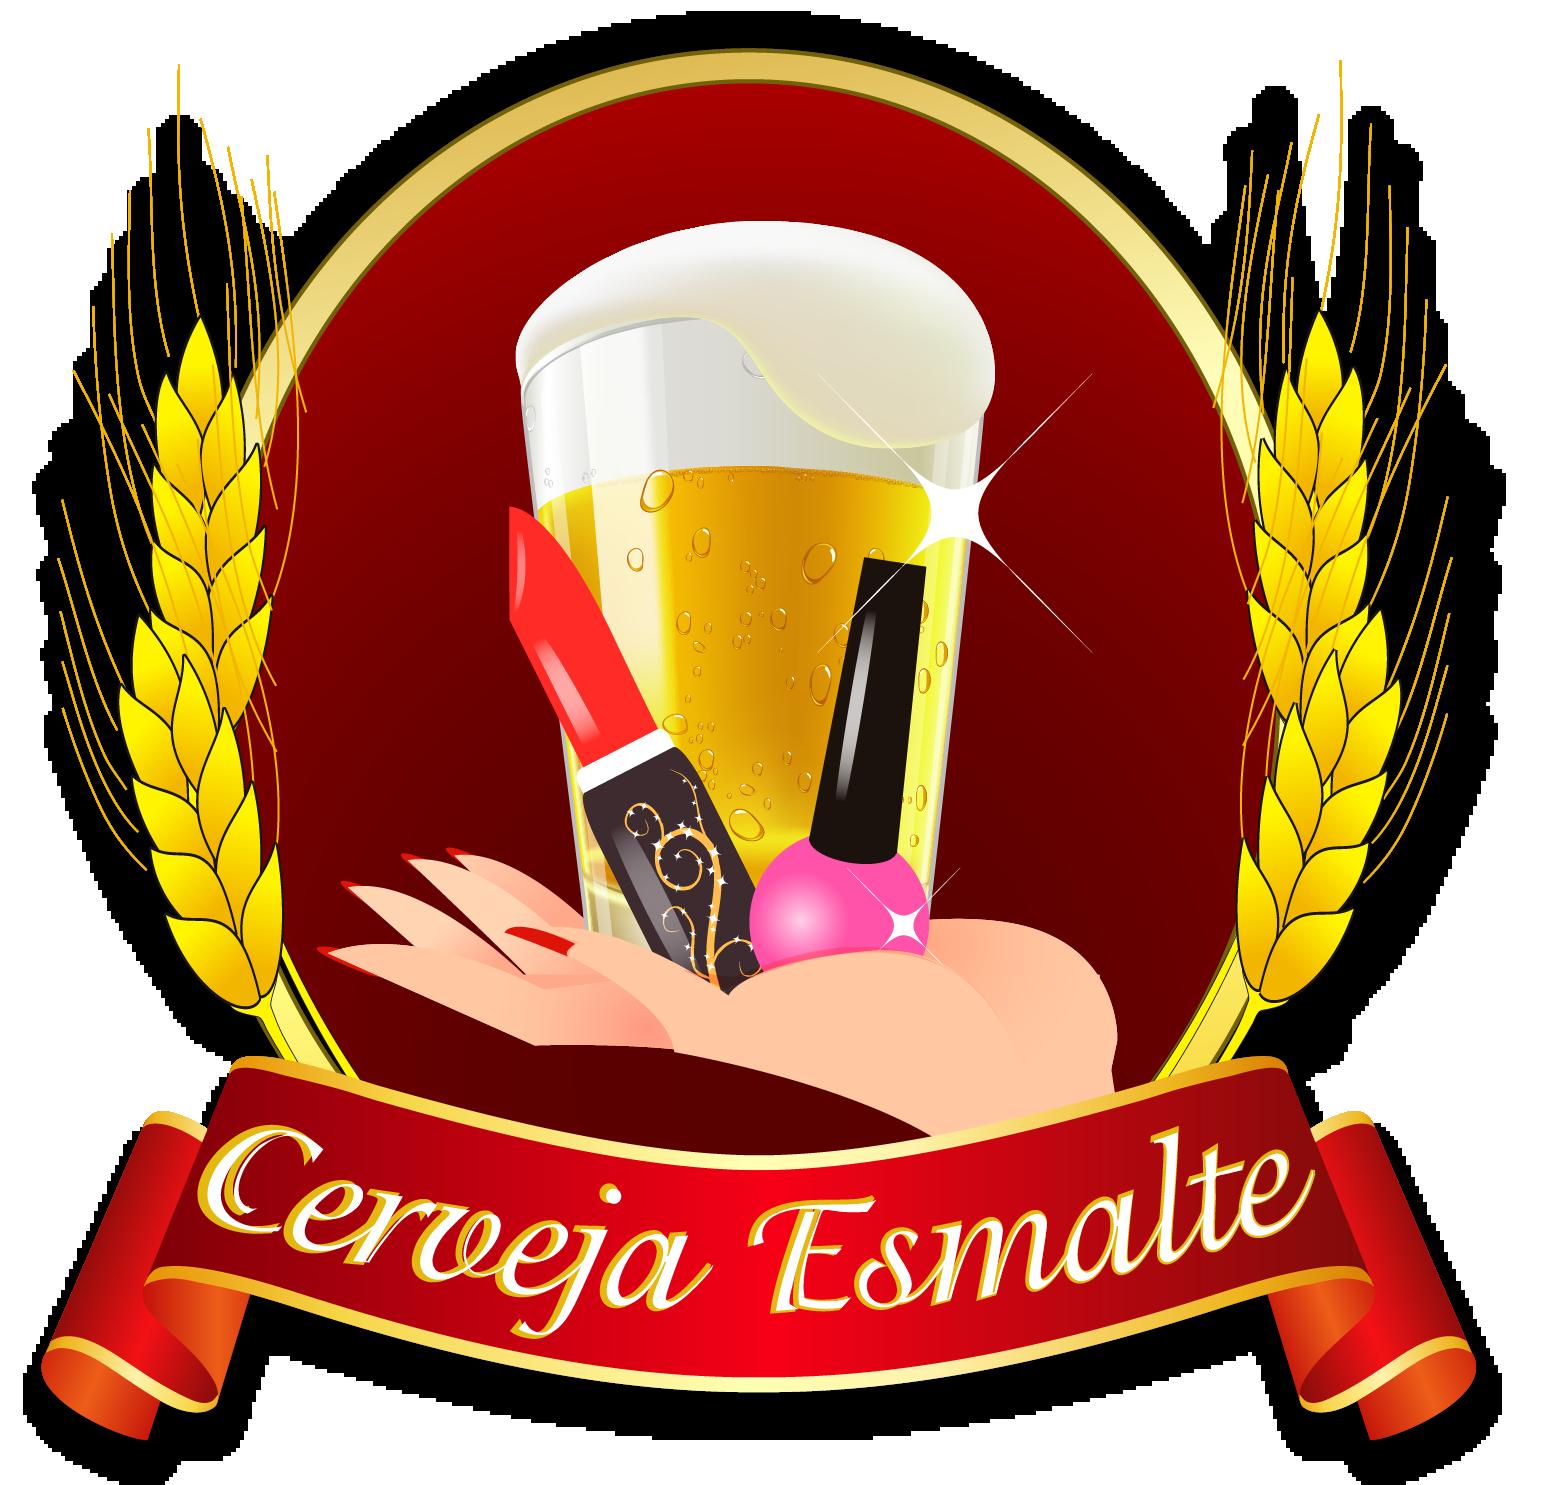 Cerveja & Esmalte